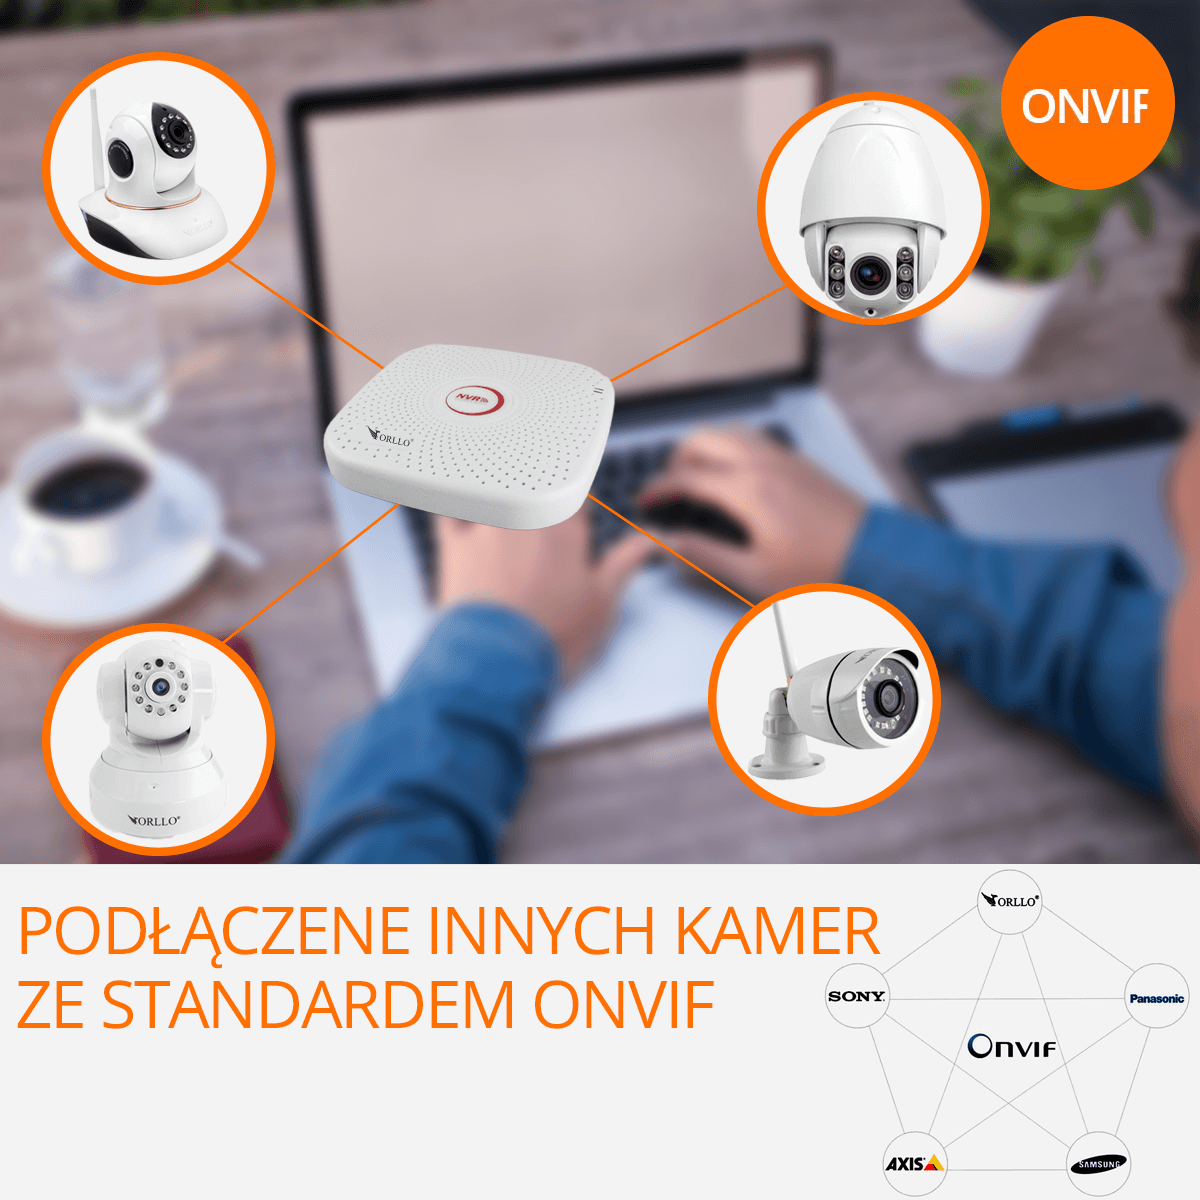 Zestaw-do-monitoringu-CAMSET-onvif-orllo-pl